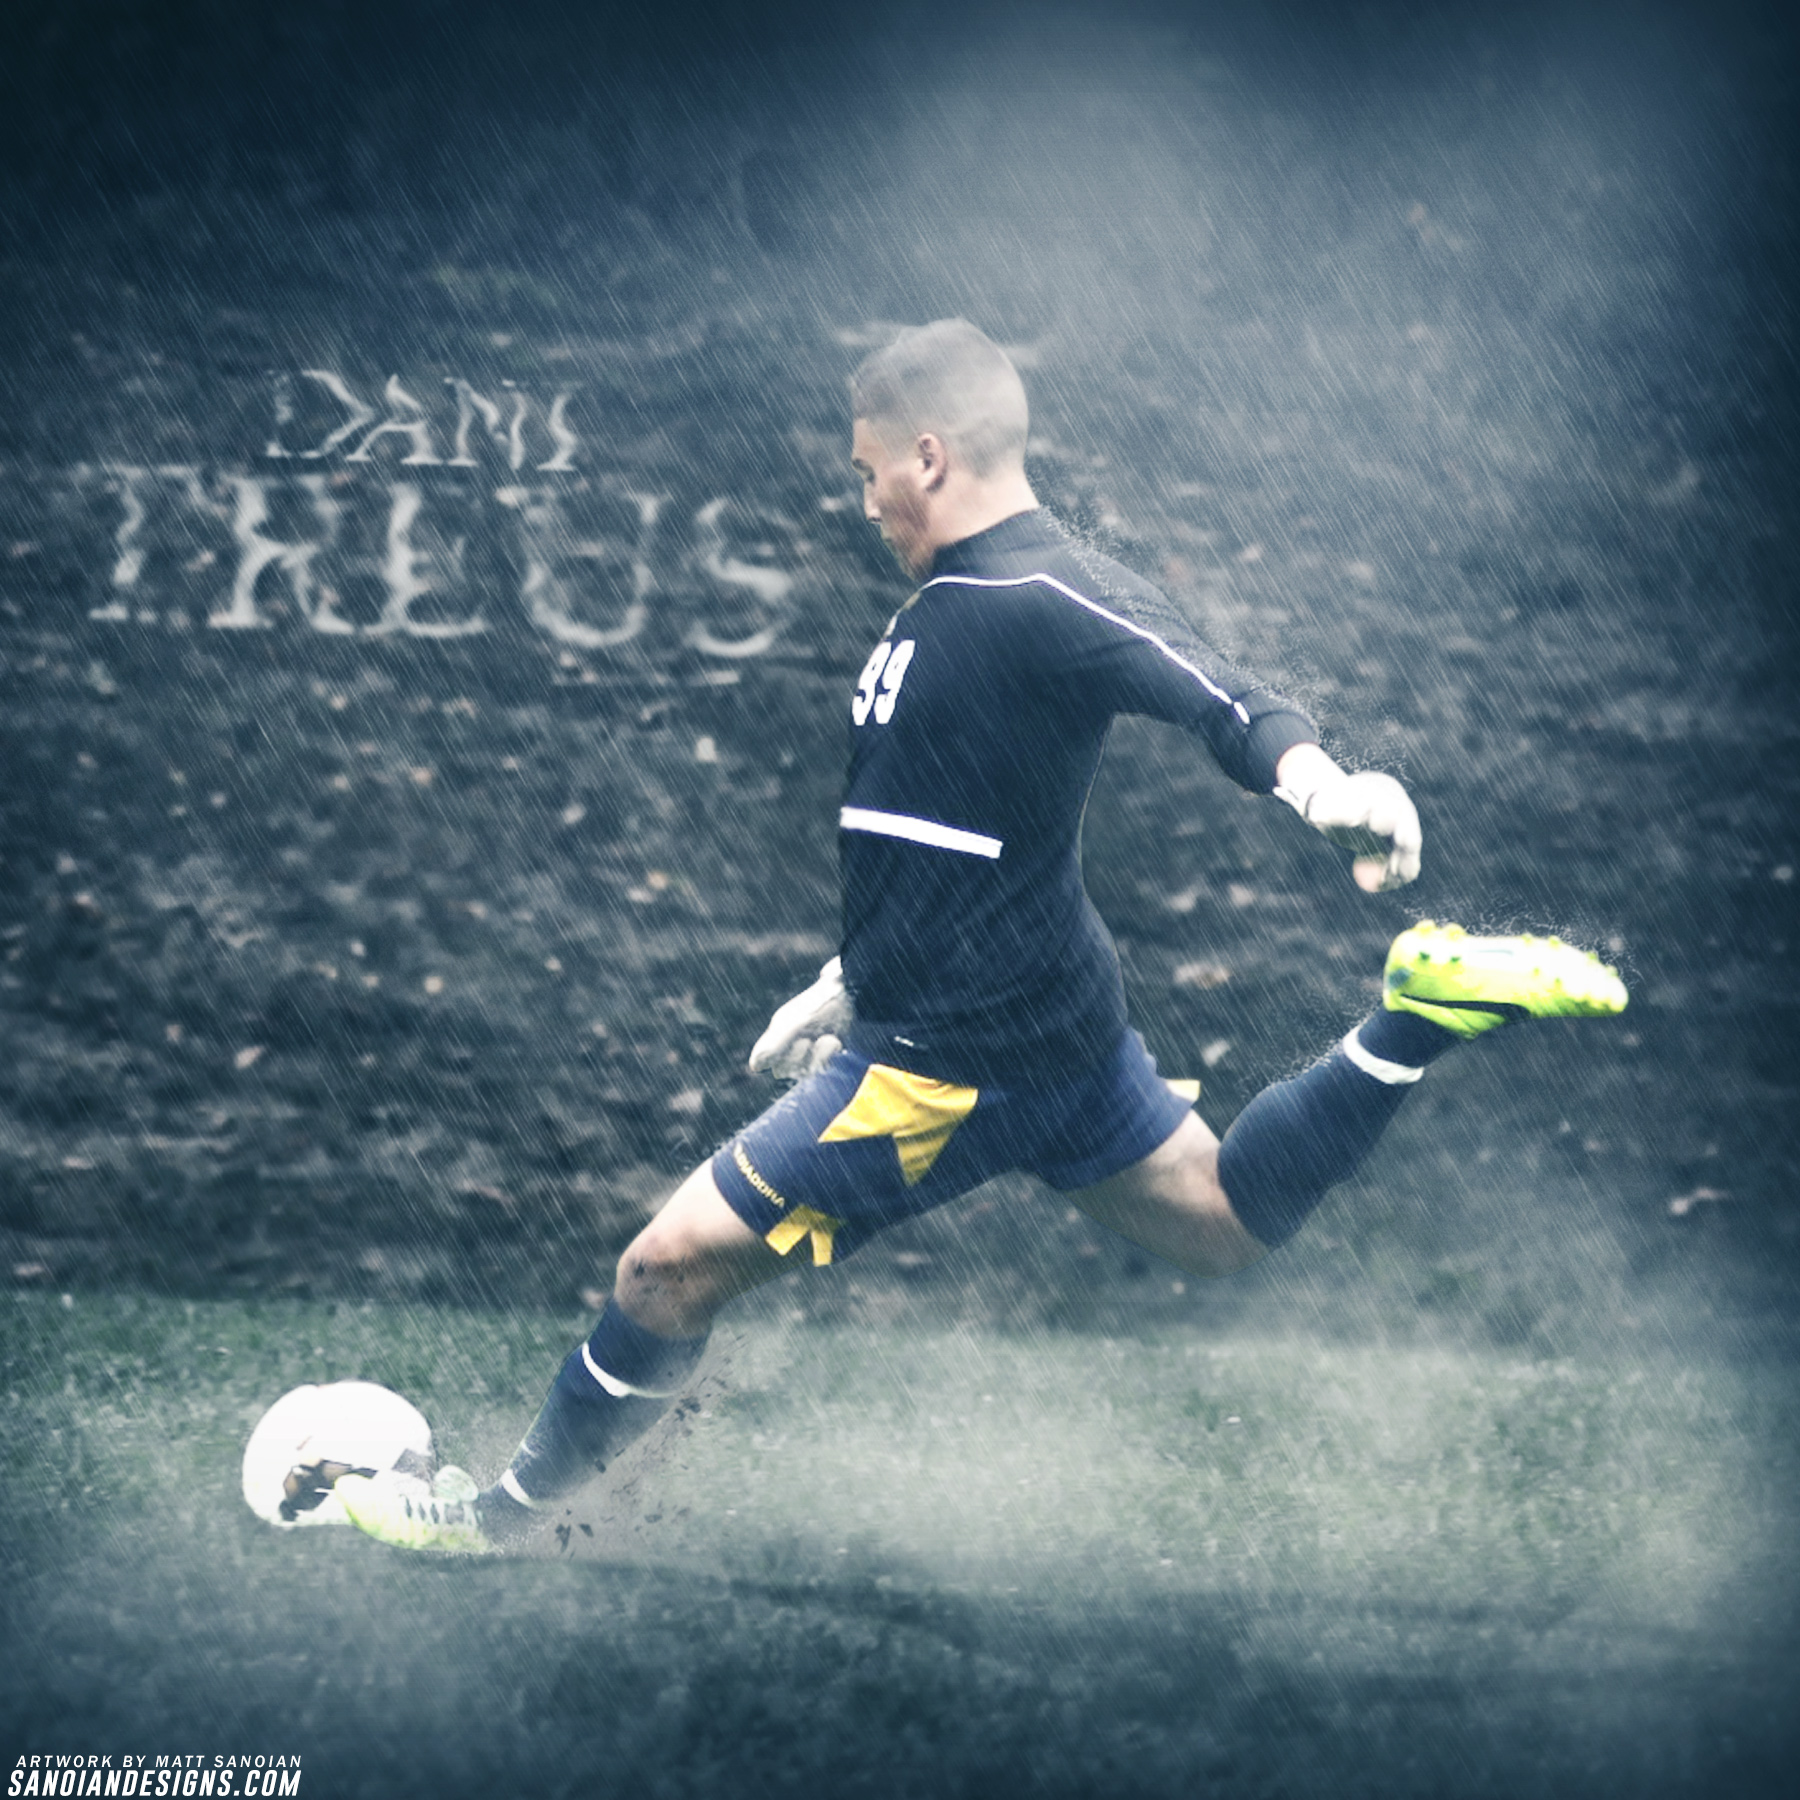 Daniel Treus - NFA Soccer Graphic